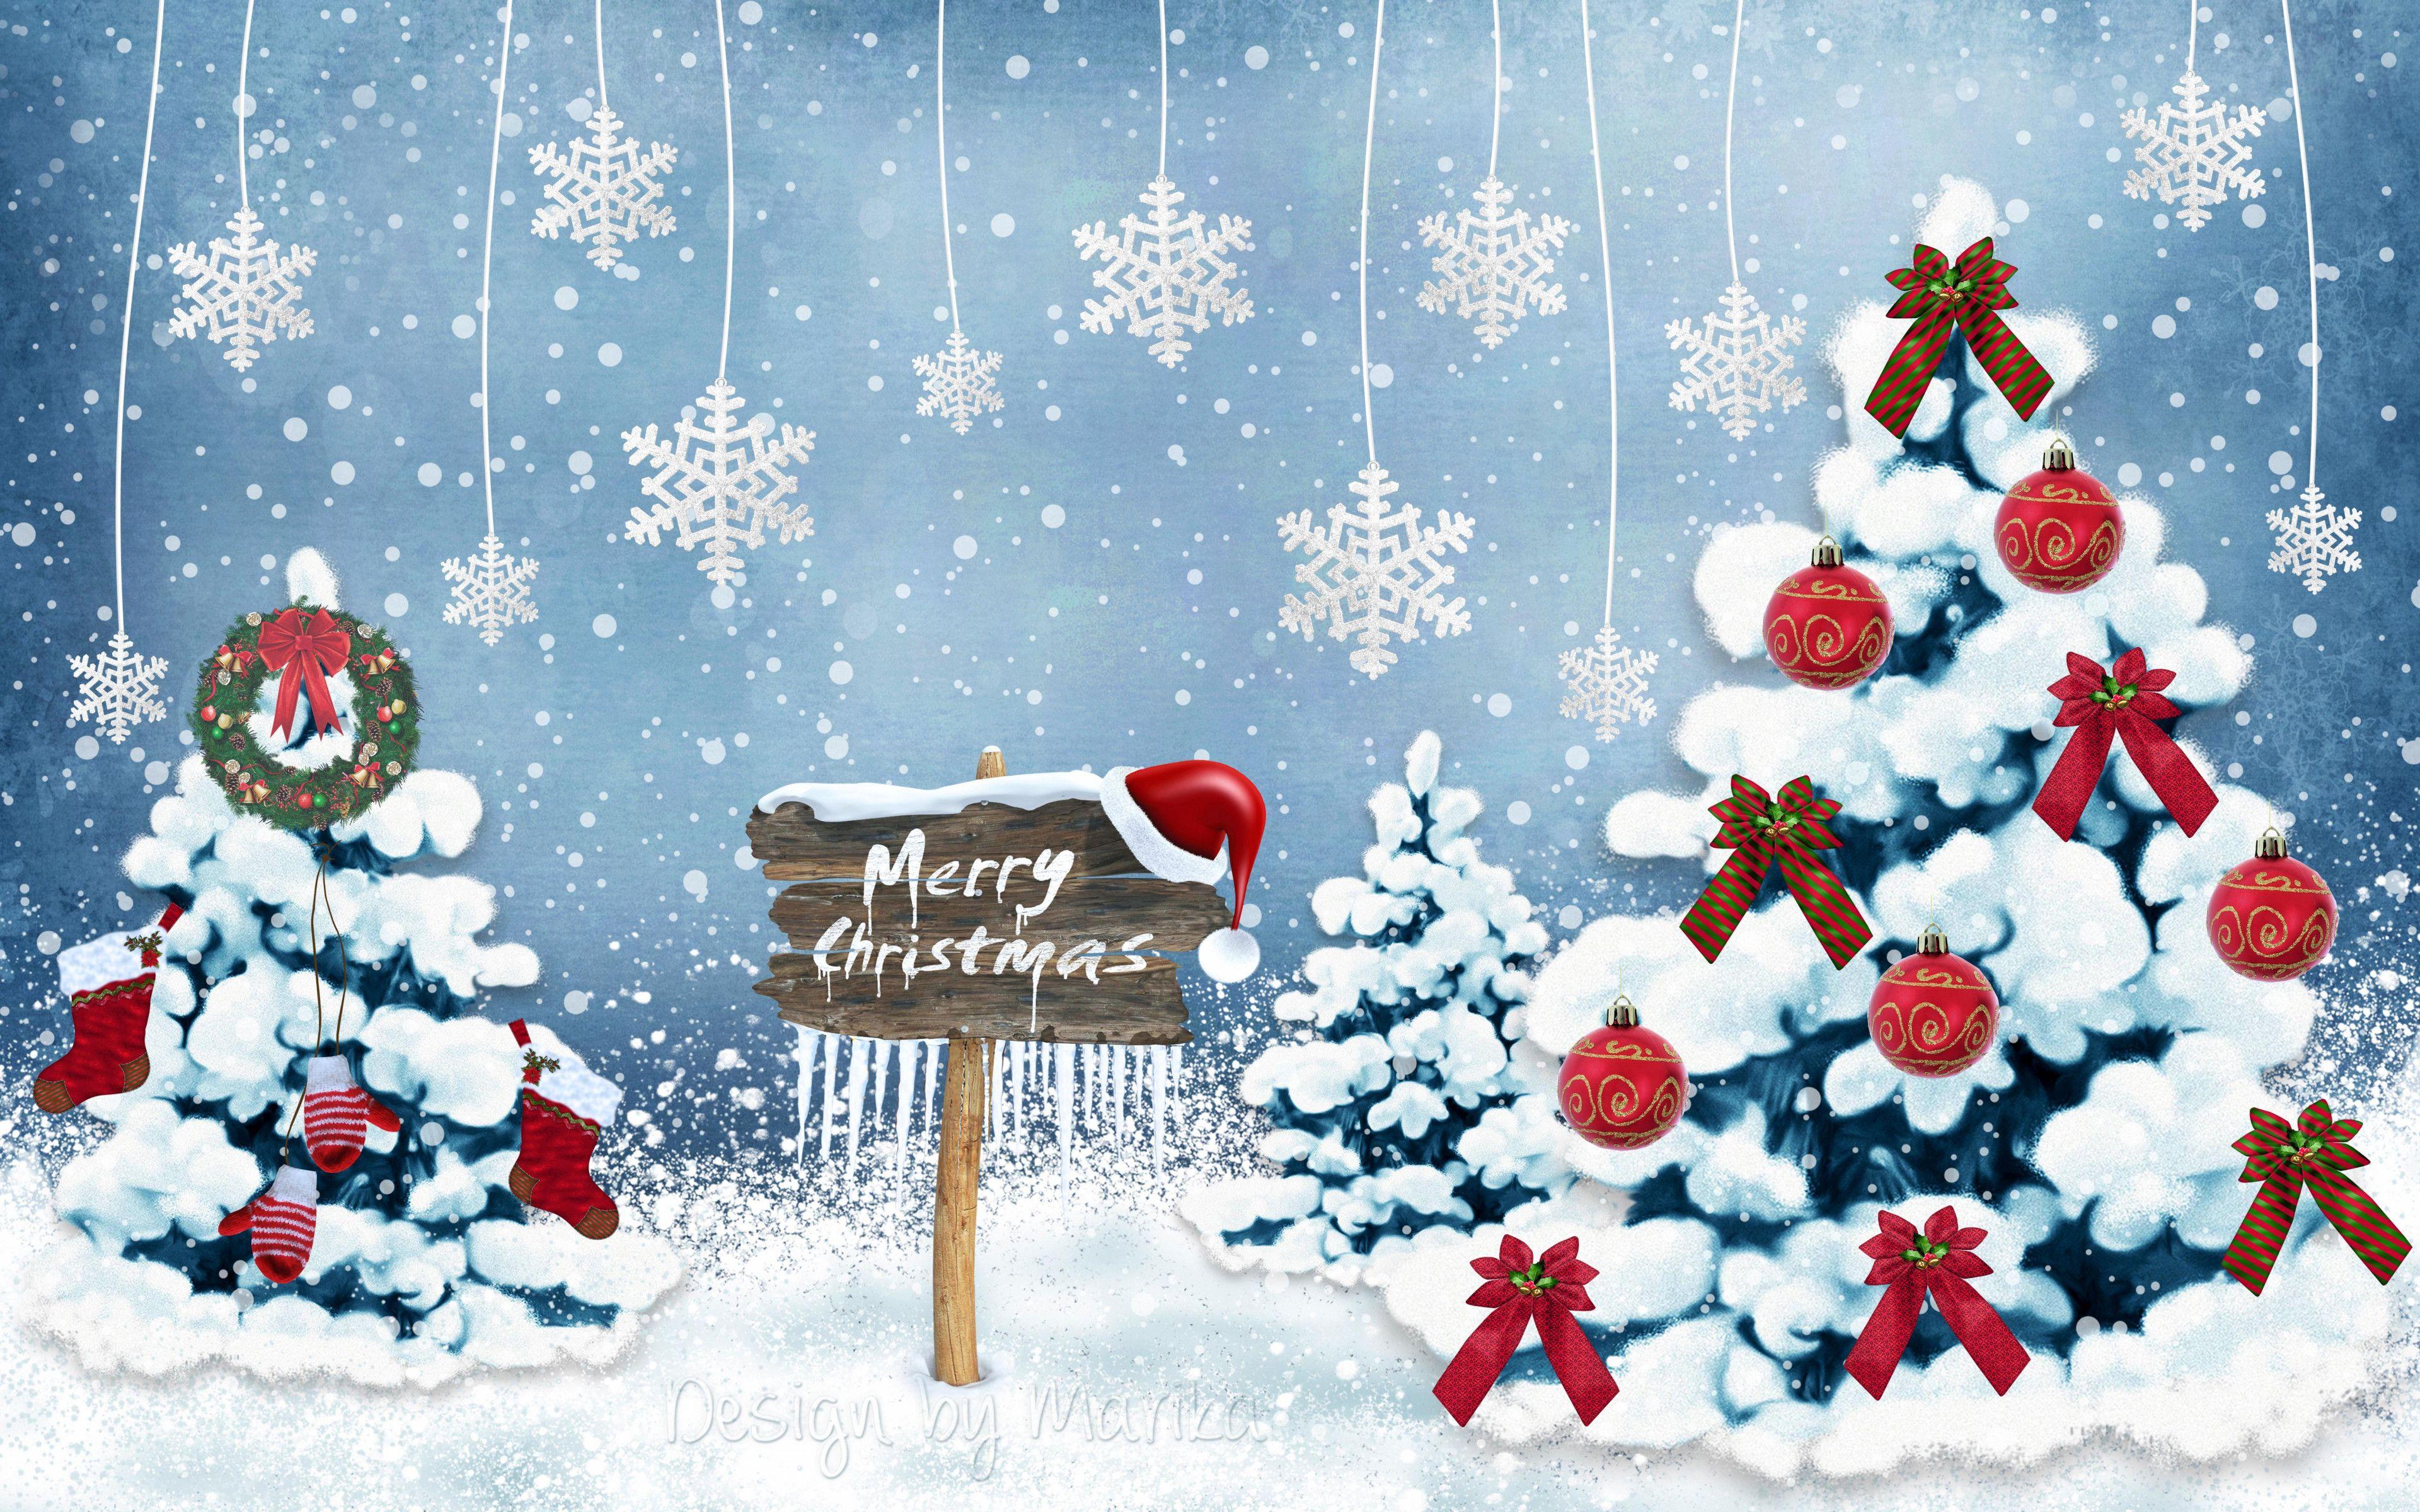 Merry Christmas Card 4k Wallpaper Merry christmas wallpaper 3840x2400